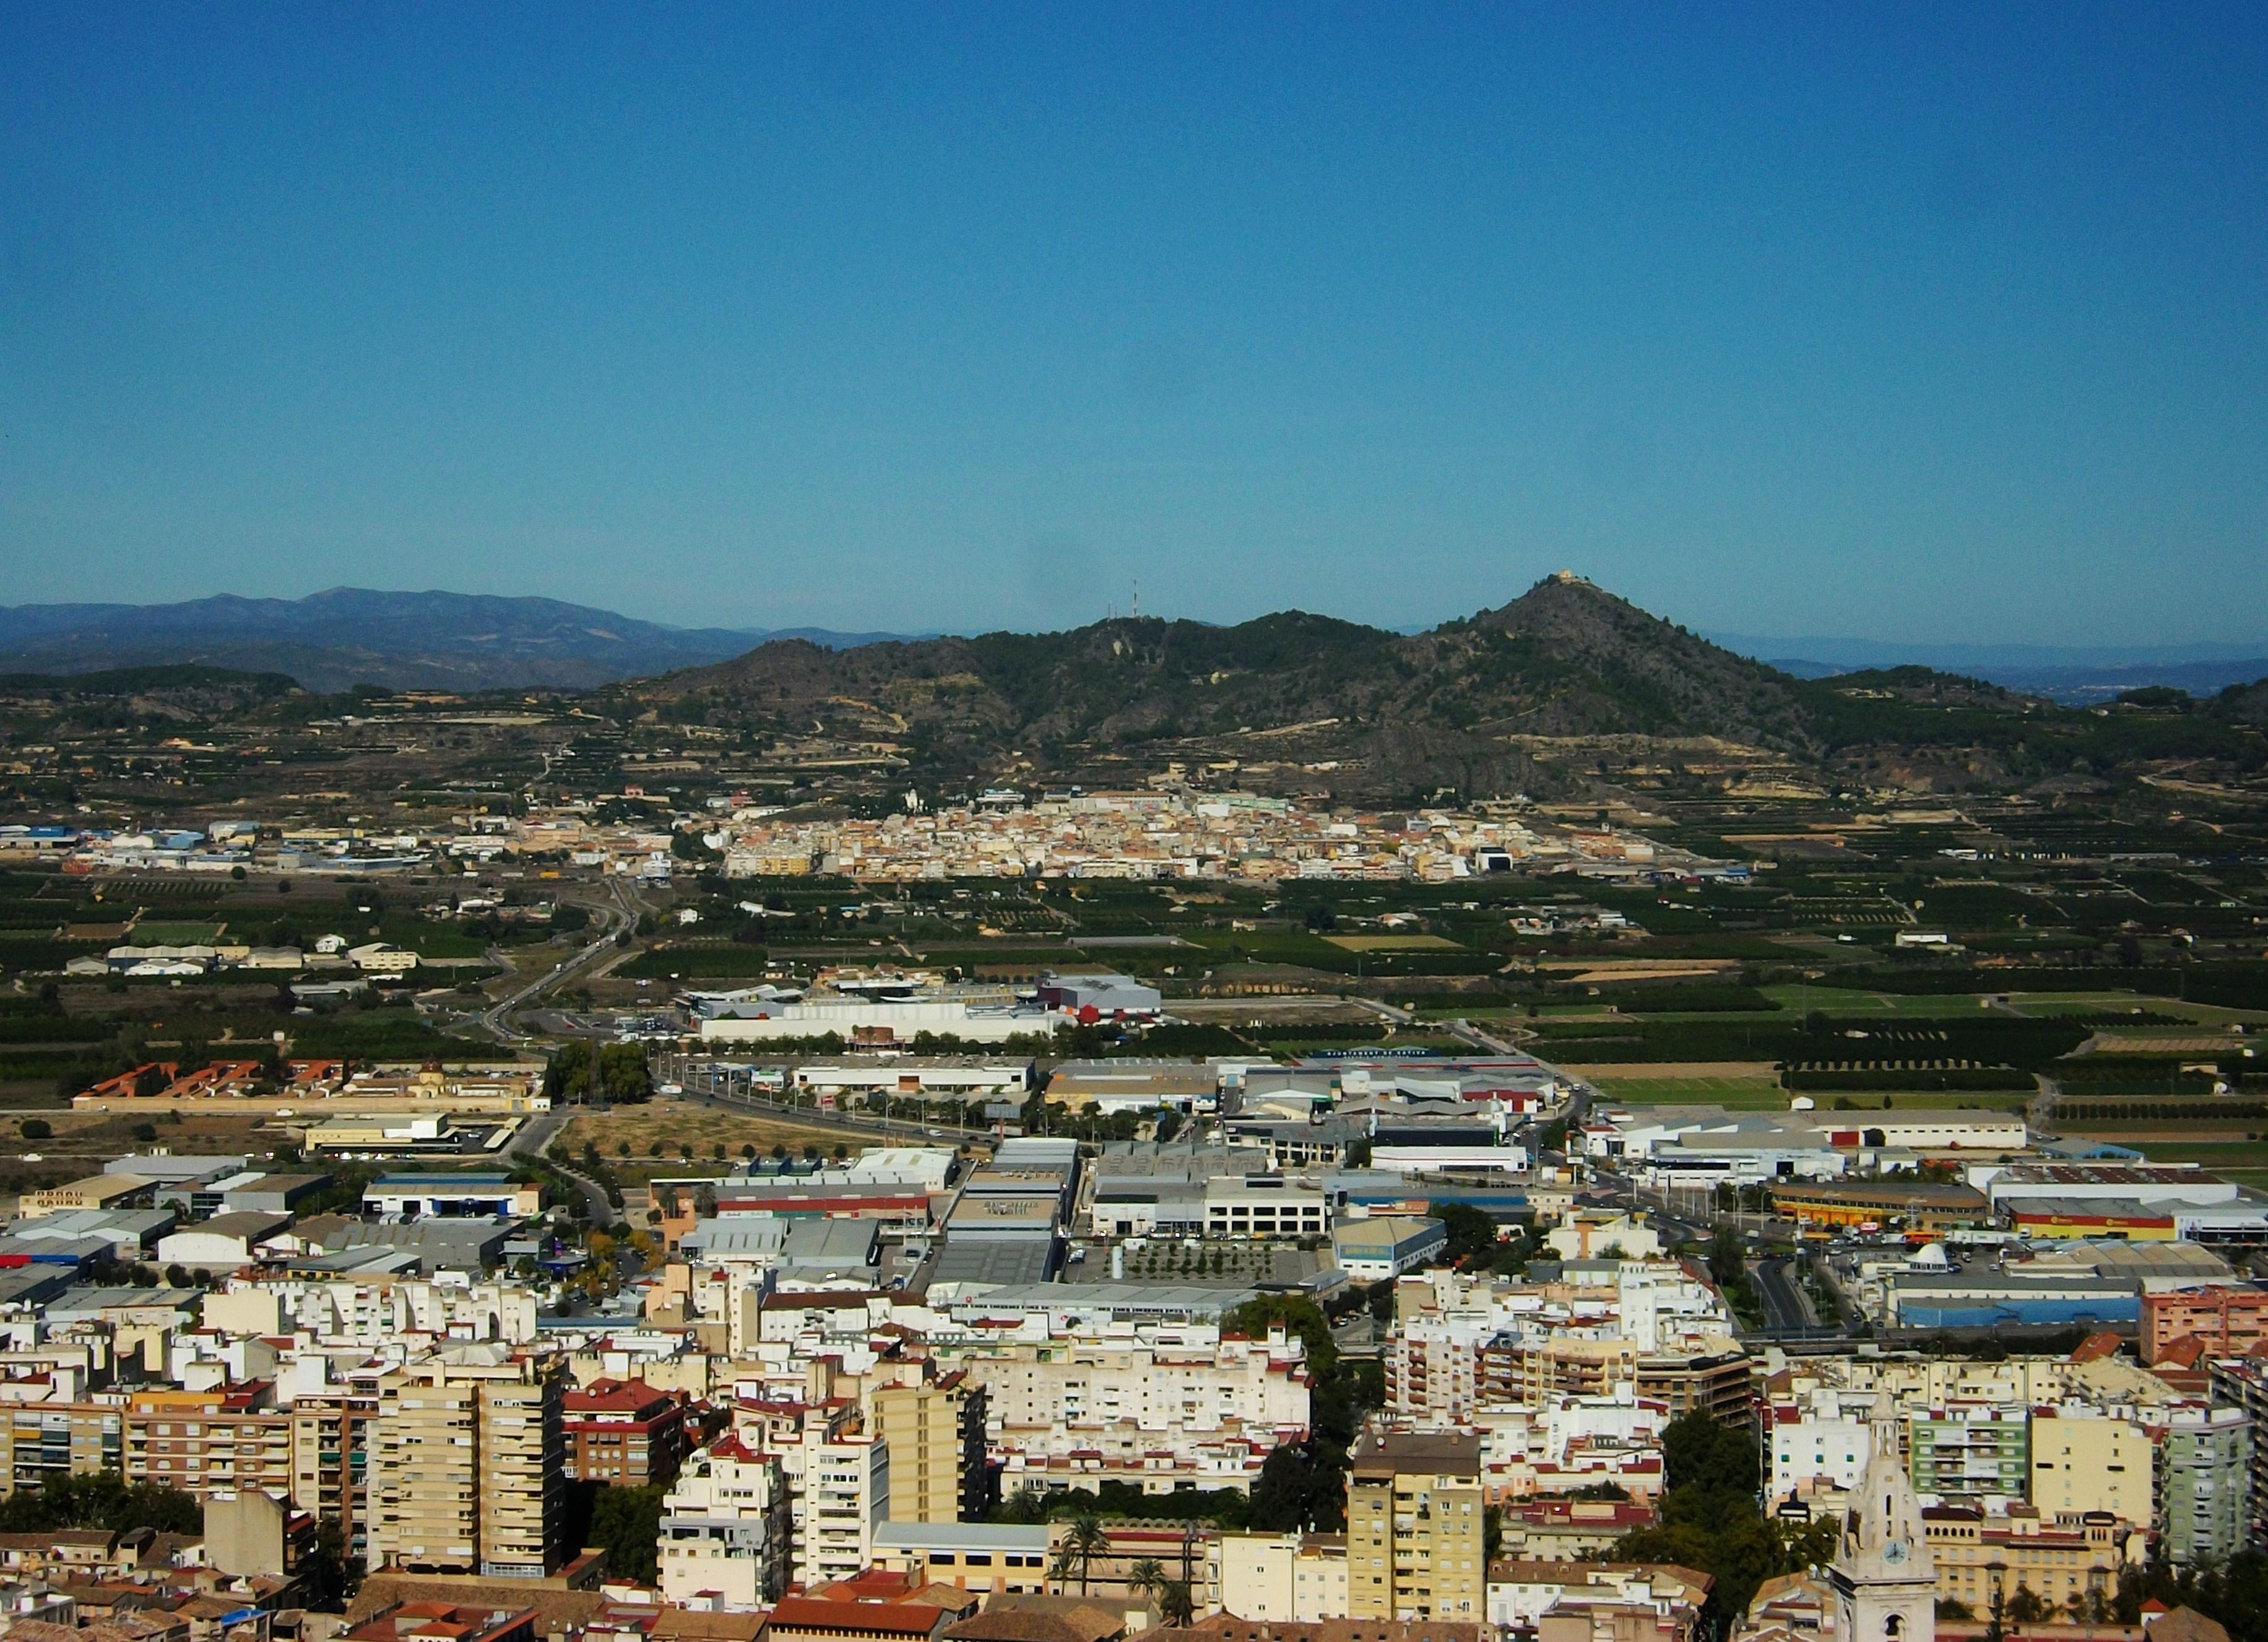 FileXàtiva i la Llosa de Ranes des del castellJPG  Wikimedia